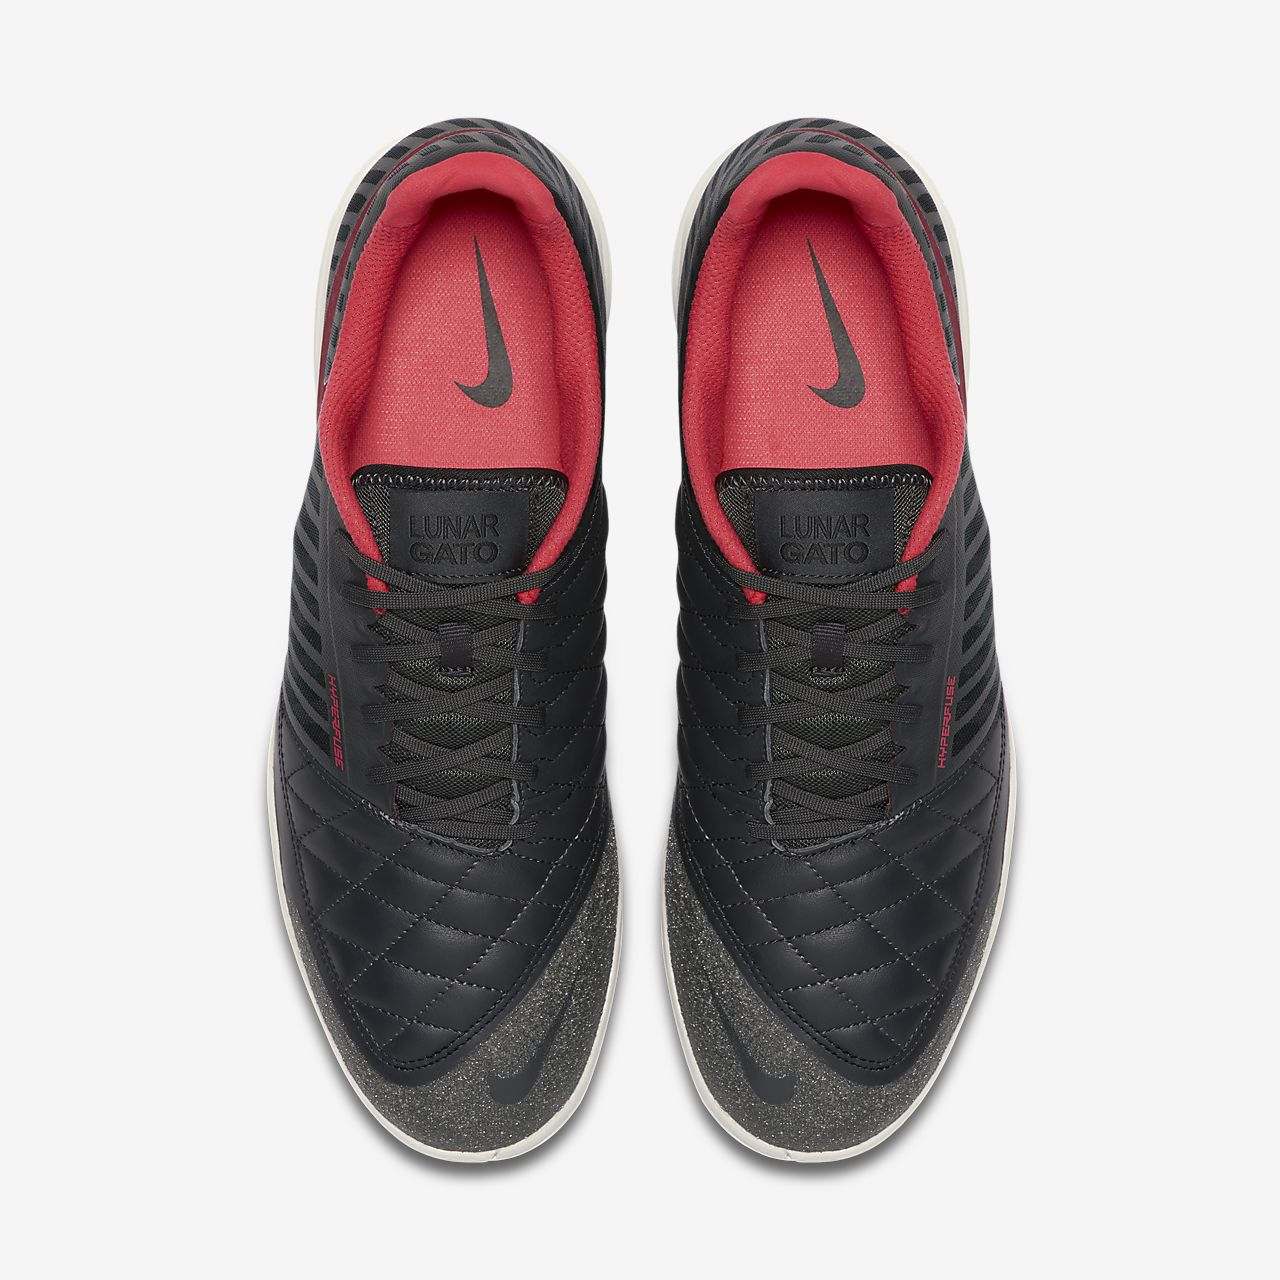 daa6390c7 FC247 LunarGato II Soccer Shoe. Nike.com